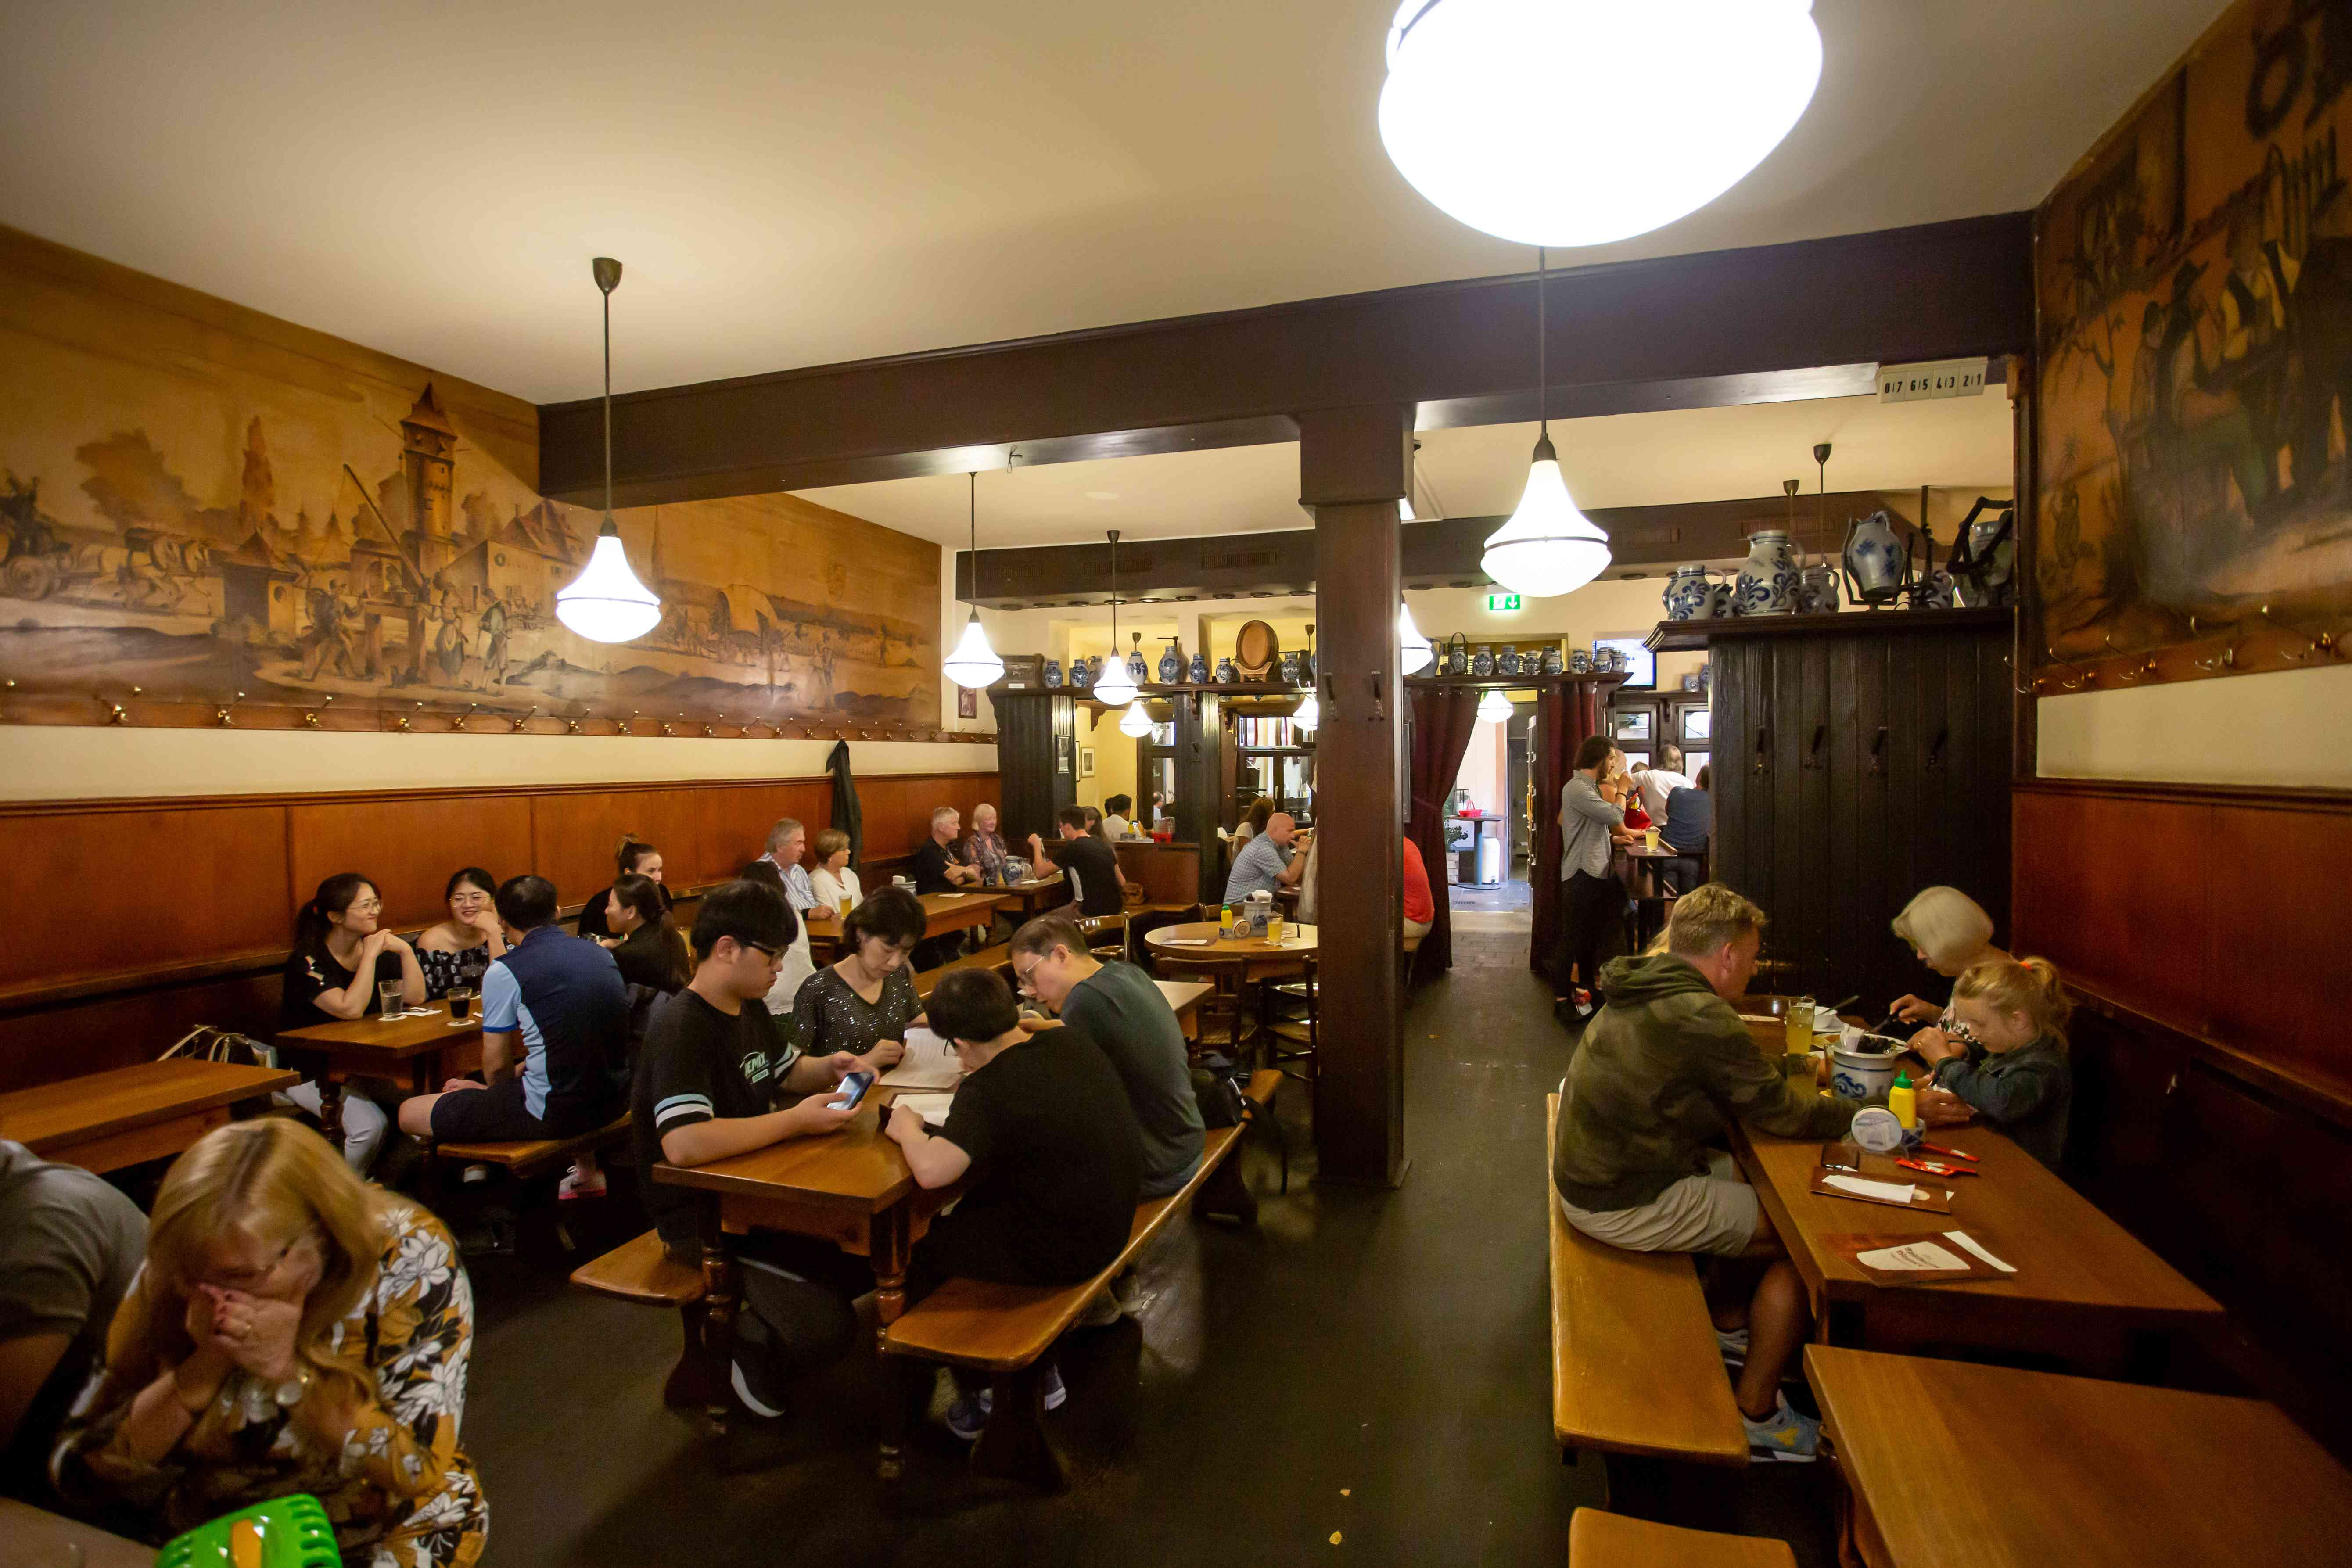 People drinking inside a Cider Tavern